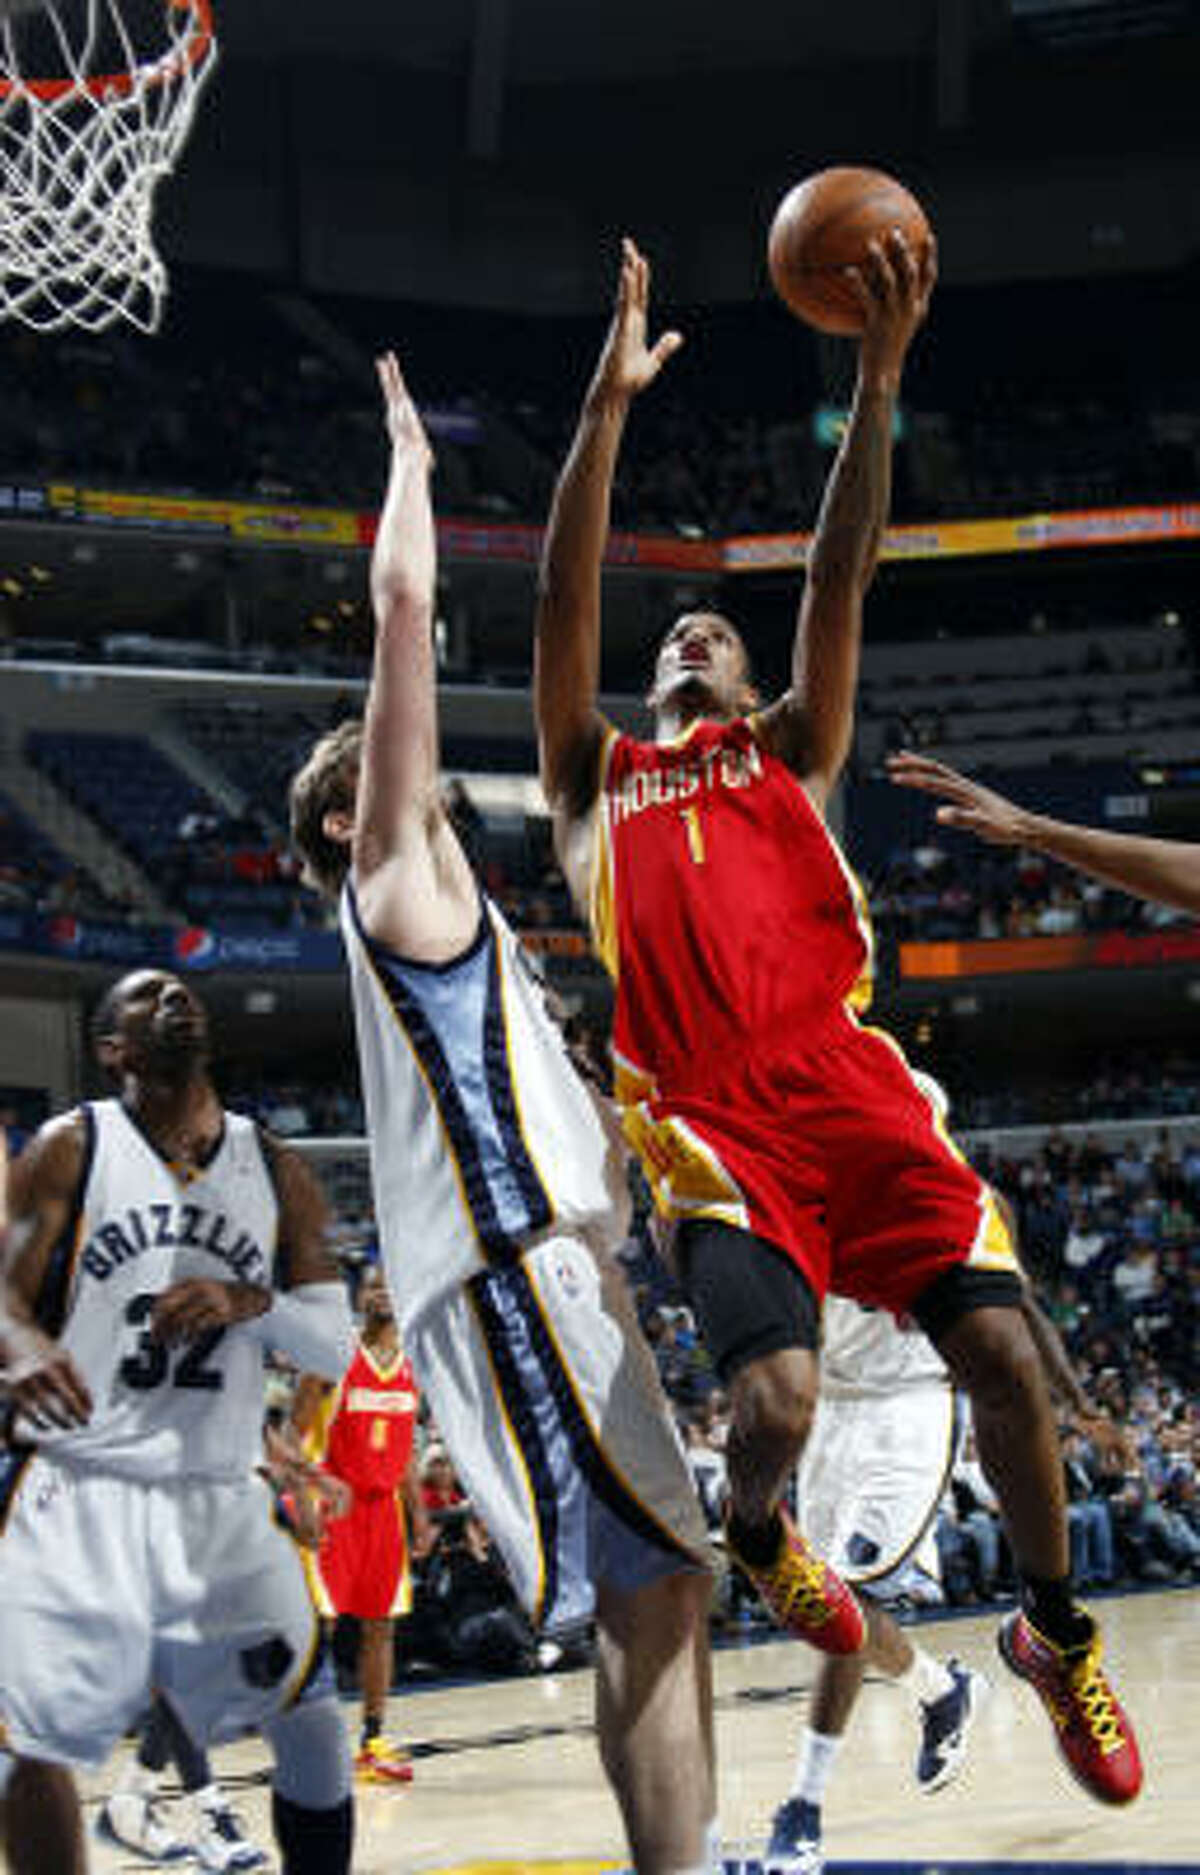 Rockets guard Trevor Ariza shoots over Grizzlies center Marc Gasol as guard O.J. Mayo watches.